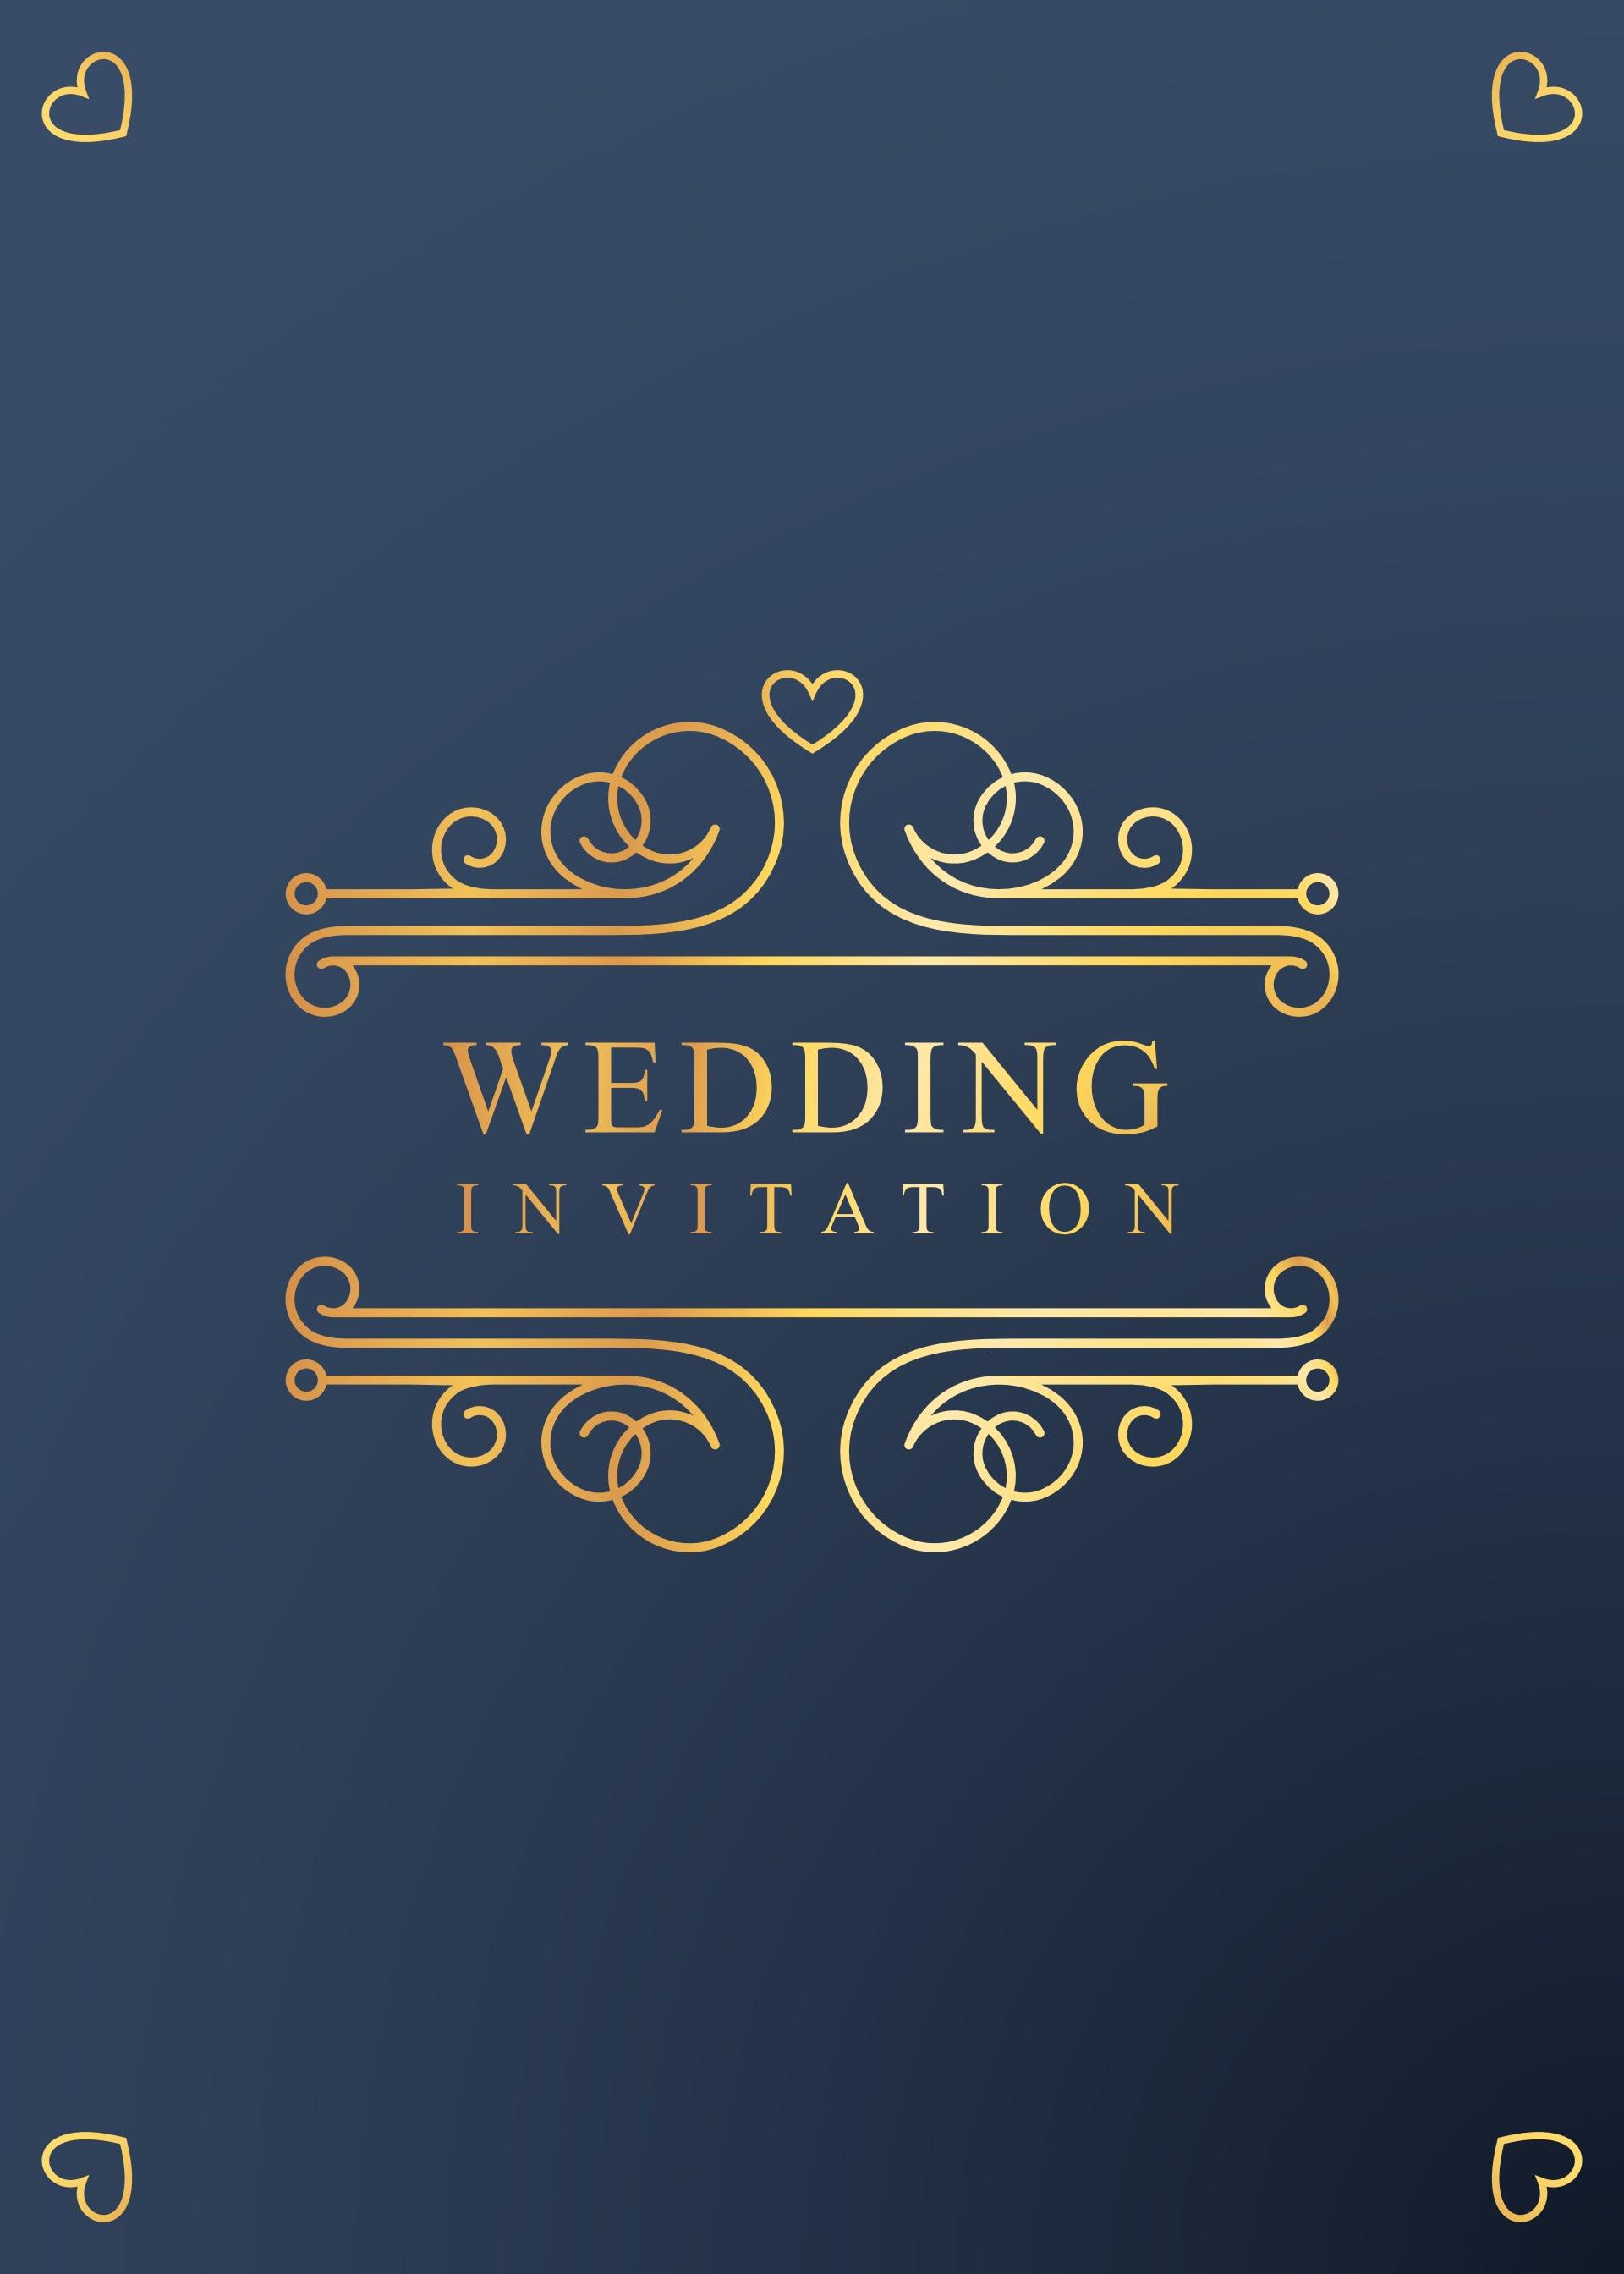 Create simple digital wedding invitation card design by Tamcik27